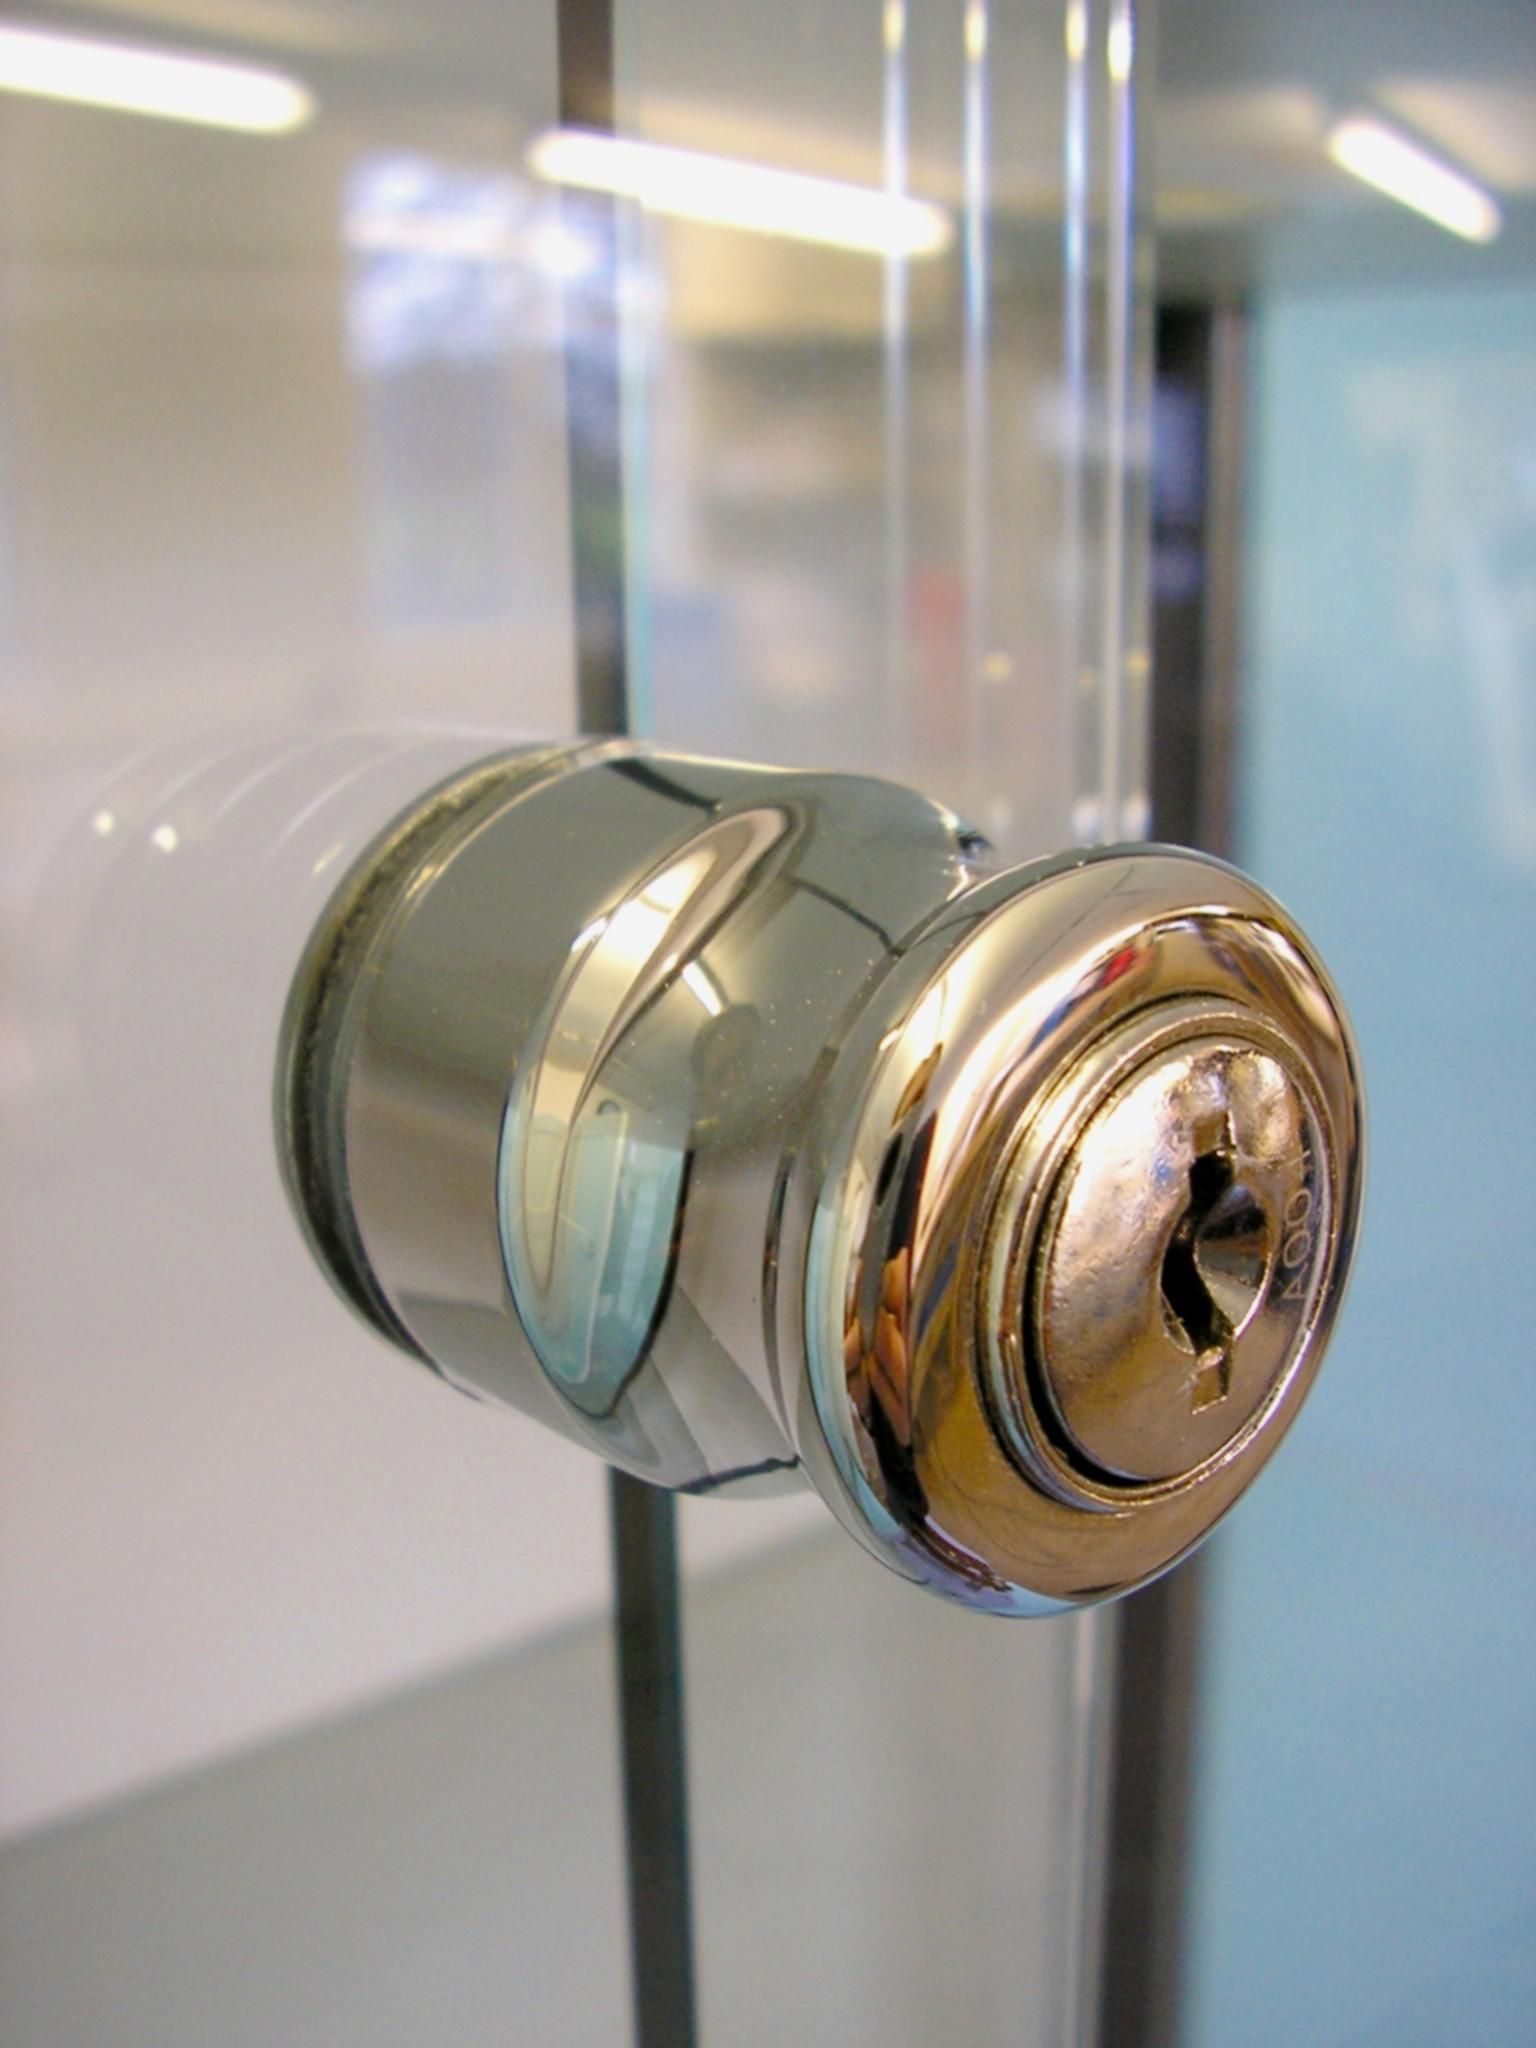 Designex Cabinets plunge lock